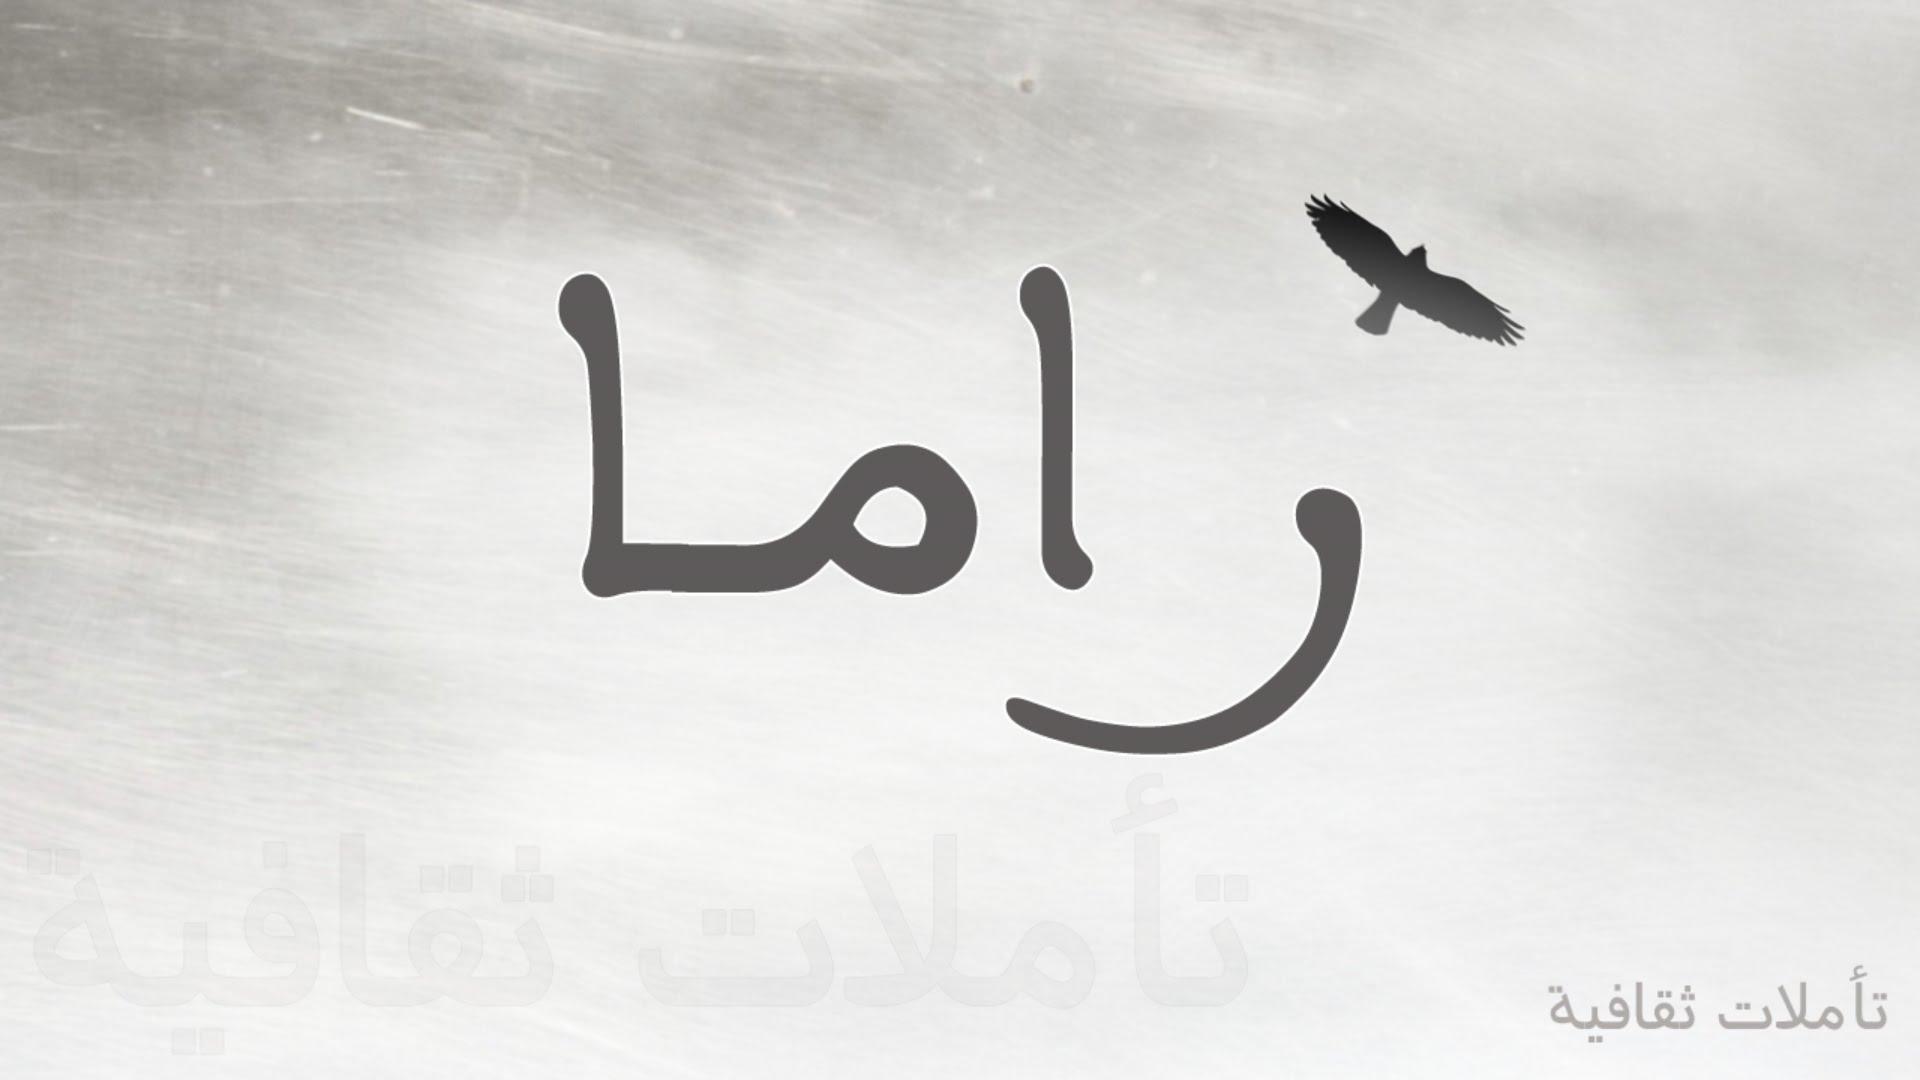 صورة معنى اسم راما , صور اسم راما ومعناها وصفات حامل الاسم 450